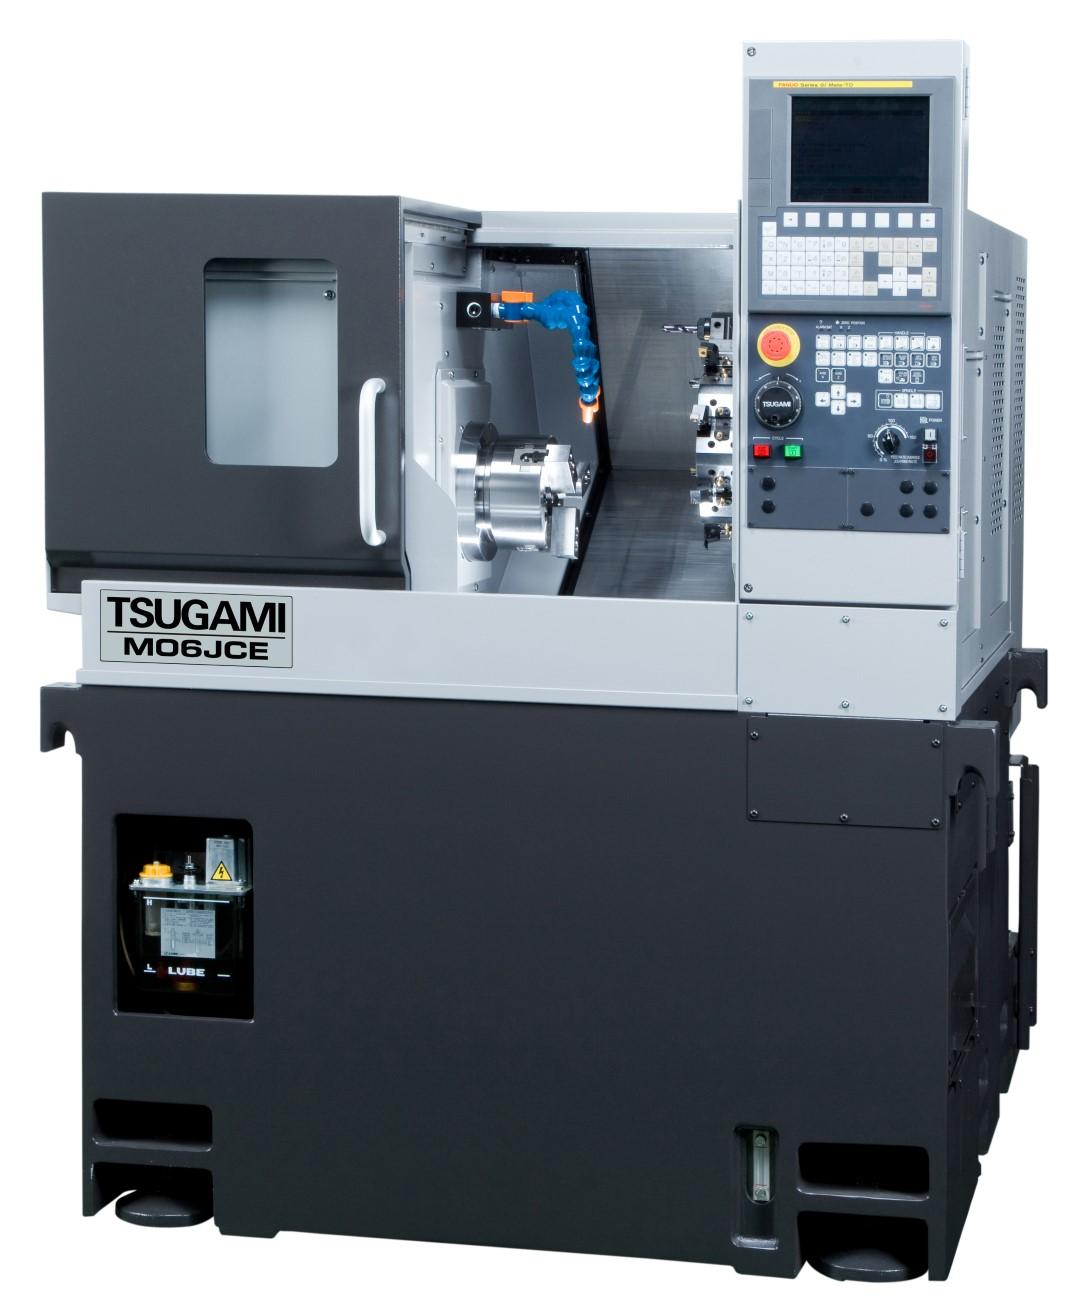 Tsugami M06JC